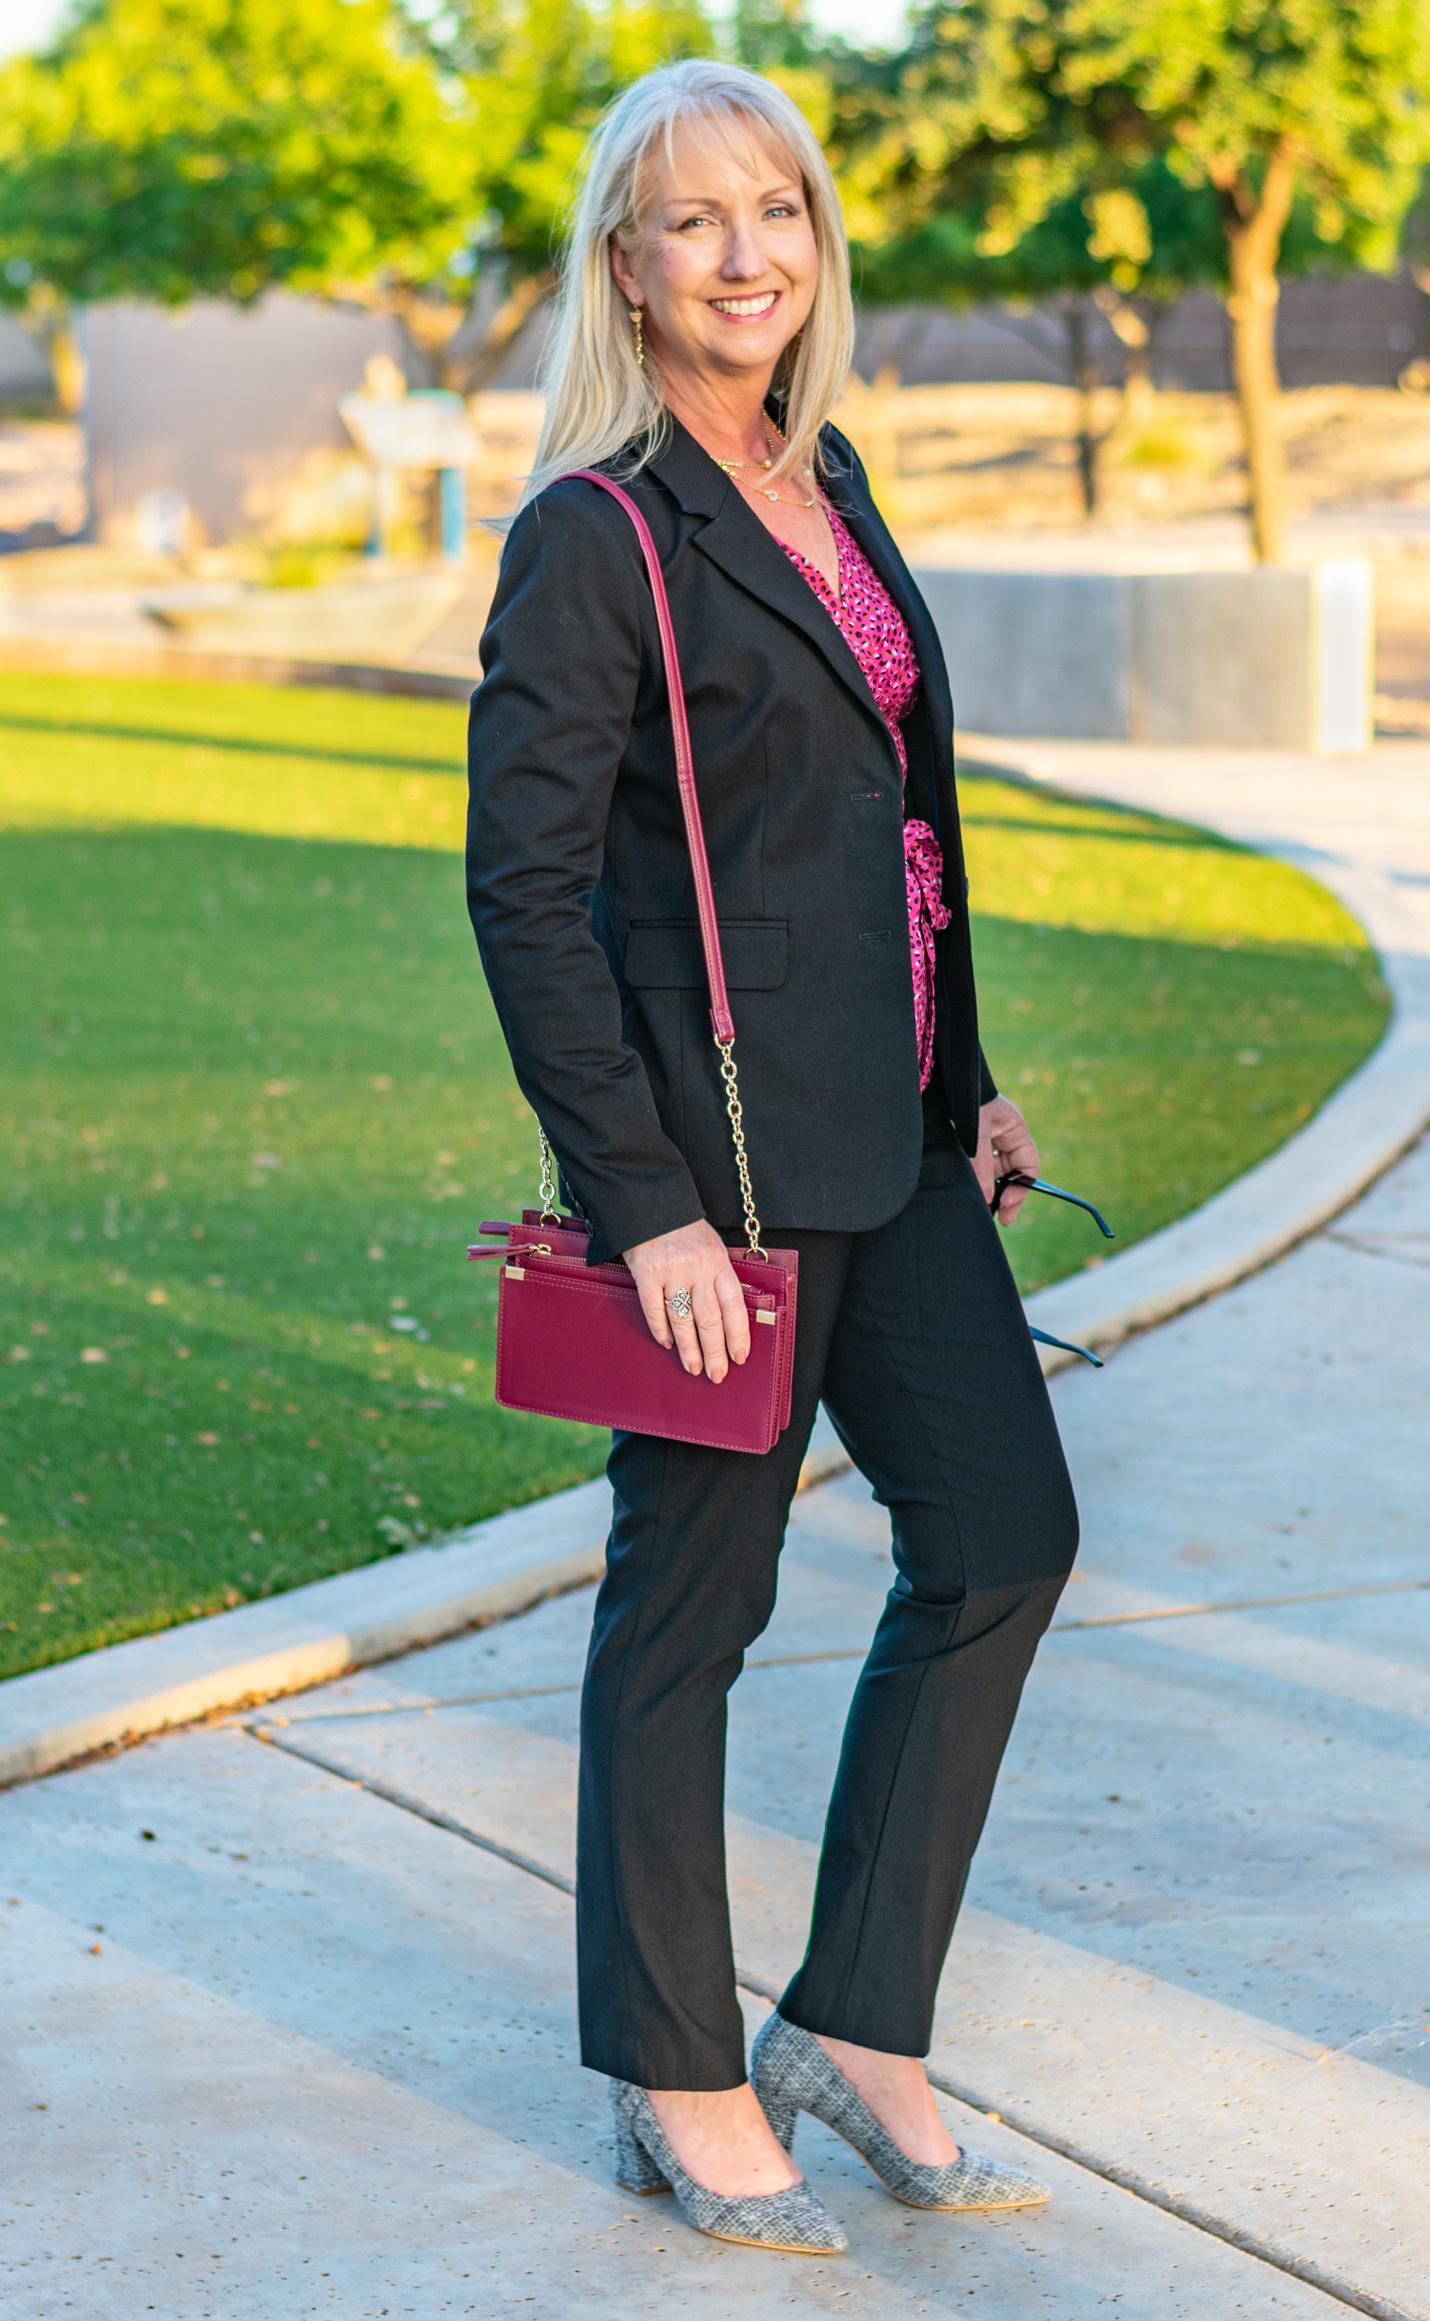 Black Blazer with Pink Wrap Top